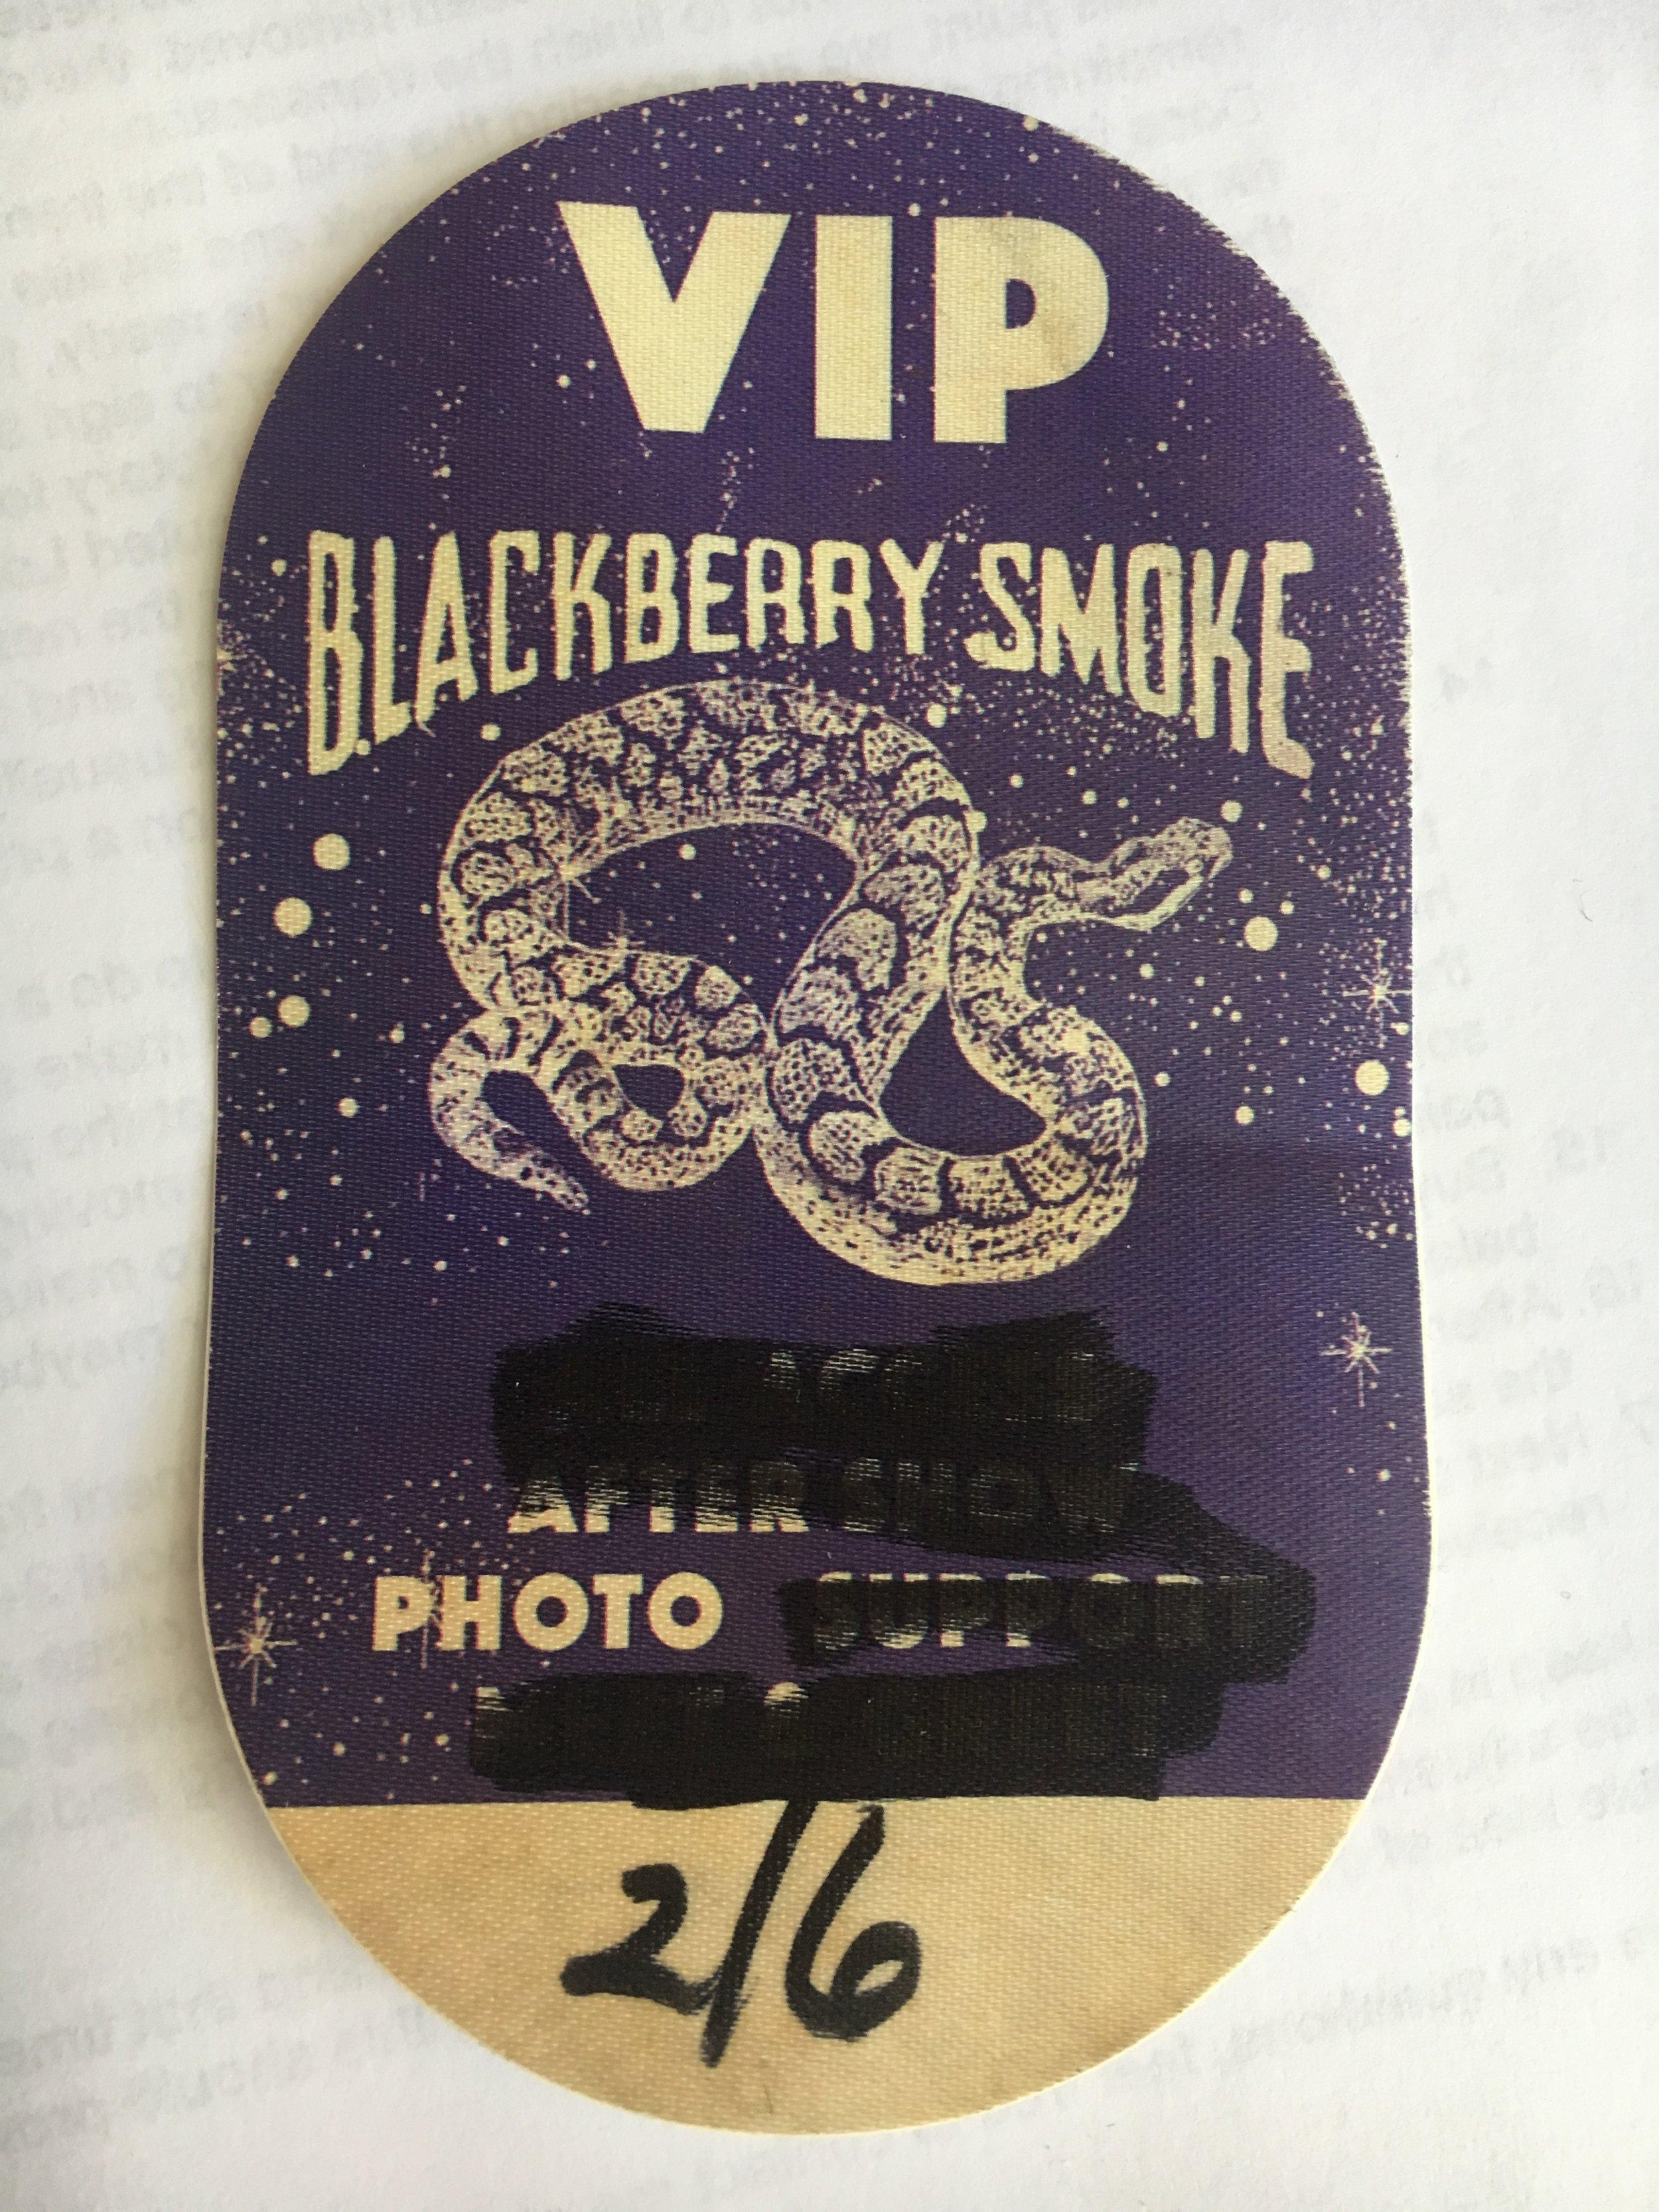 Blackberry Smoke pass.JPG